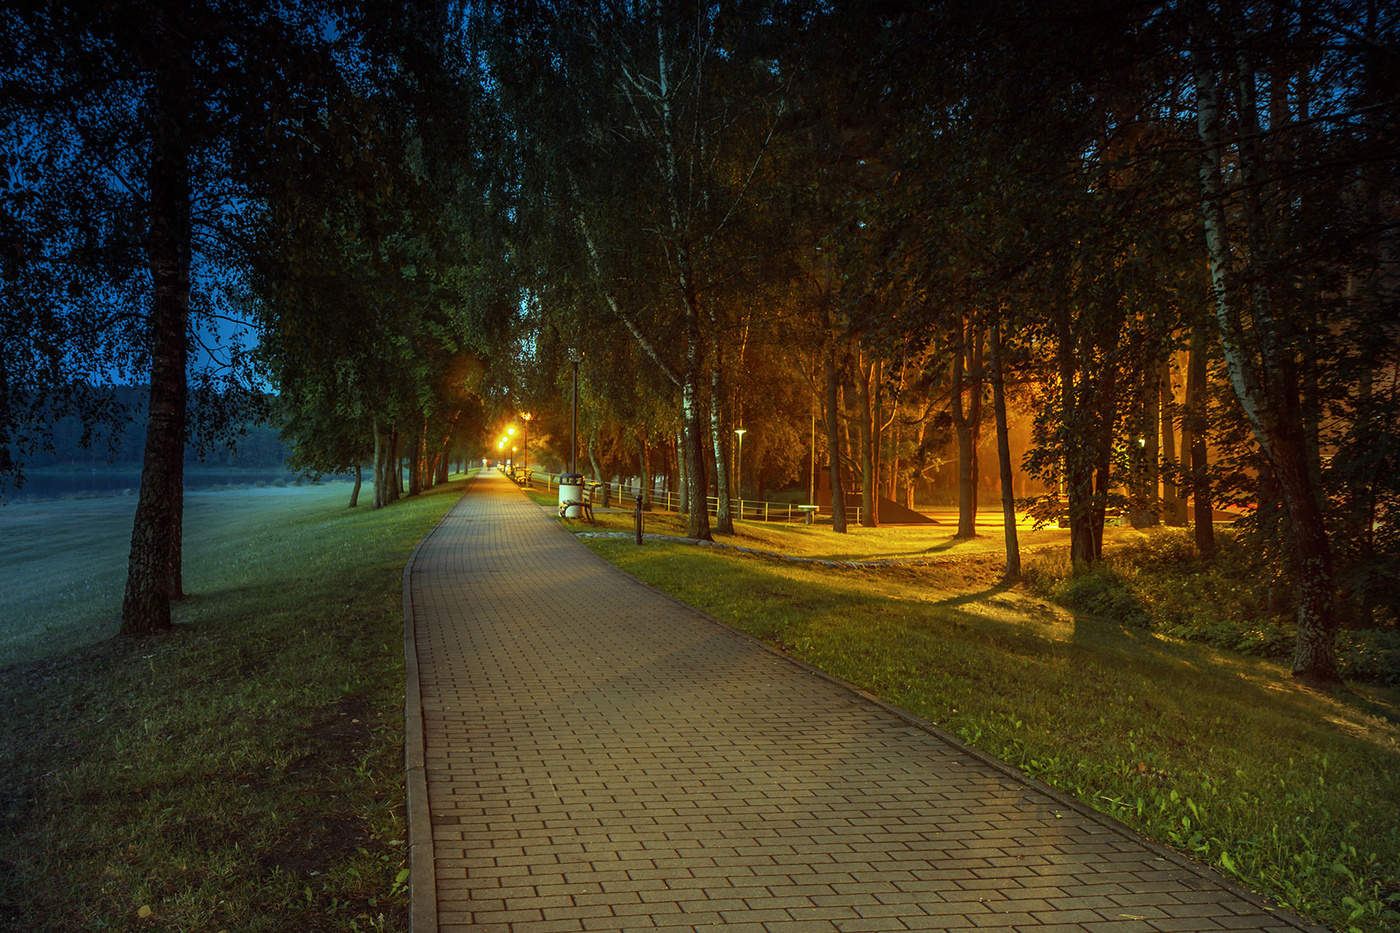 Вечерняя прогулка по тропинкам картинки